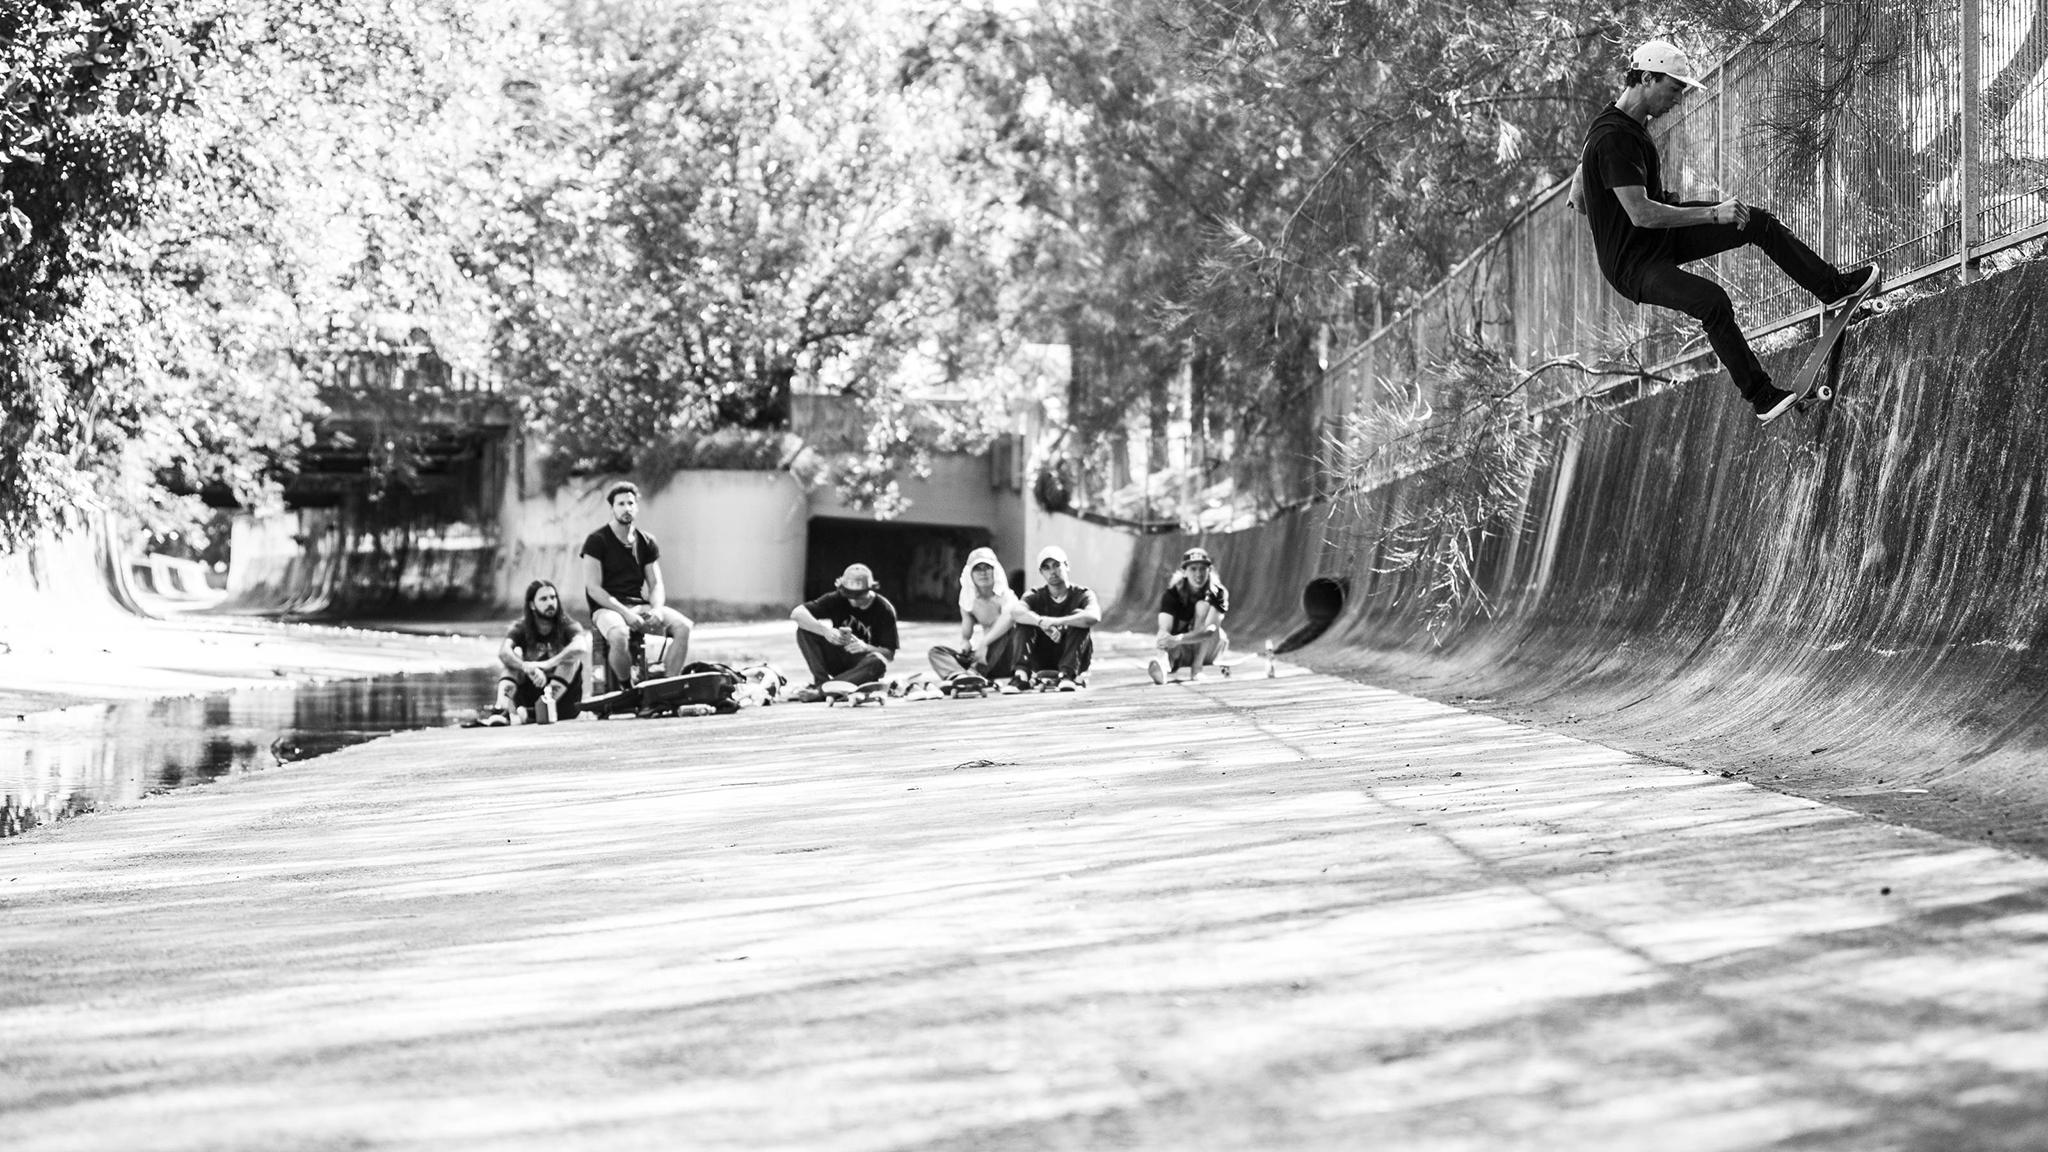 No shortage of skate spots